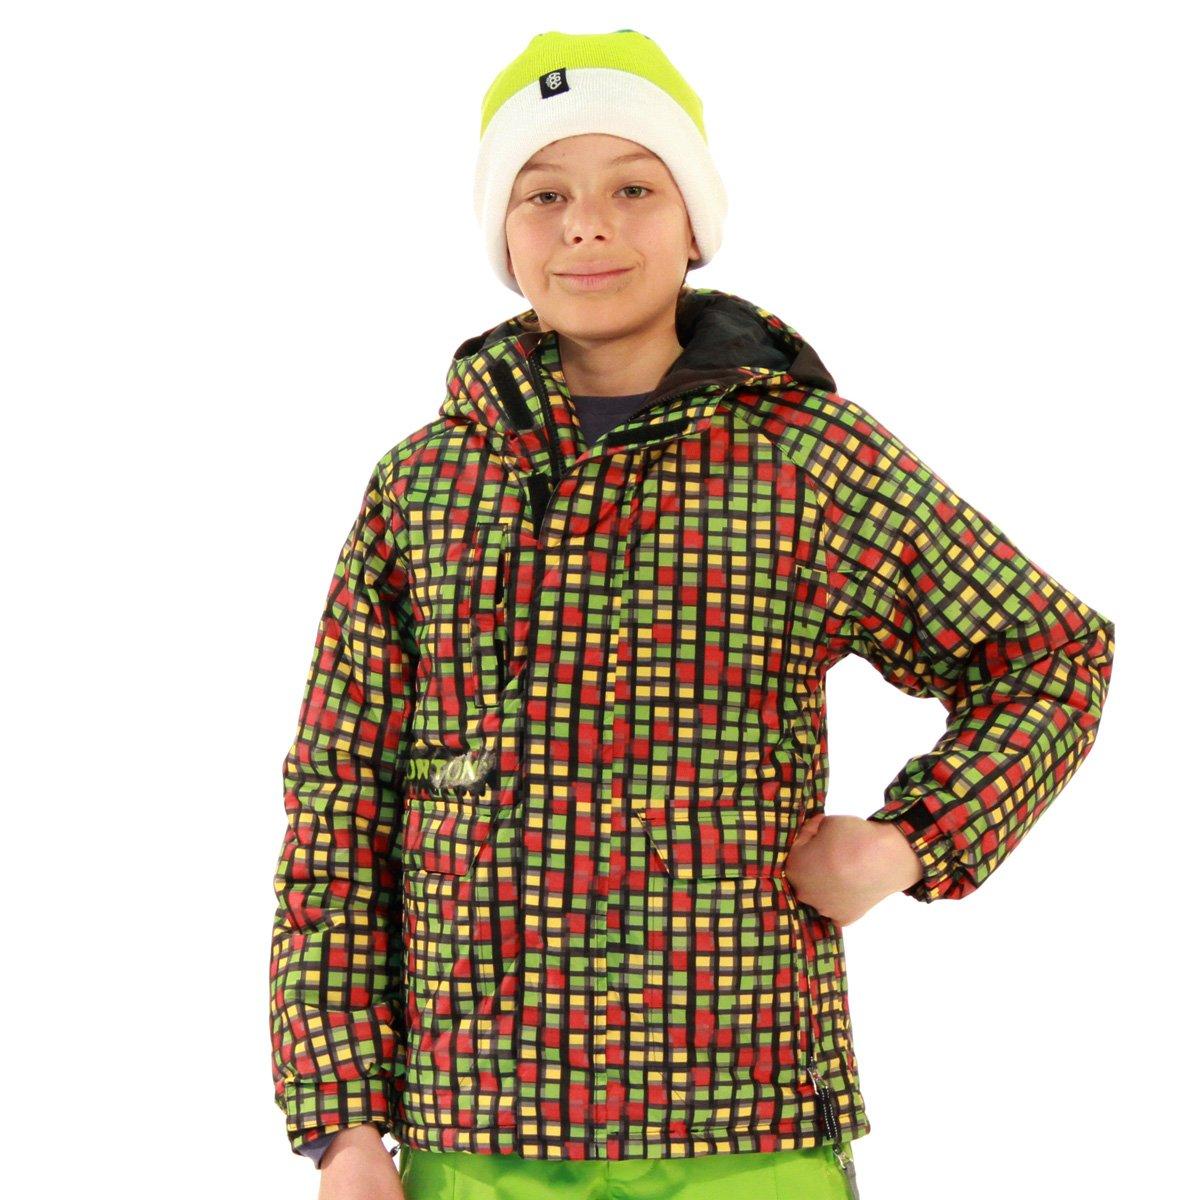 BURTON Kinder Snowboardjacke Boys Kinder SLUDGE jetzt kaufen